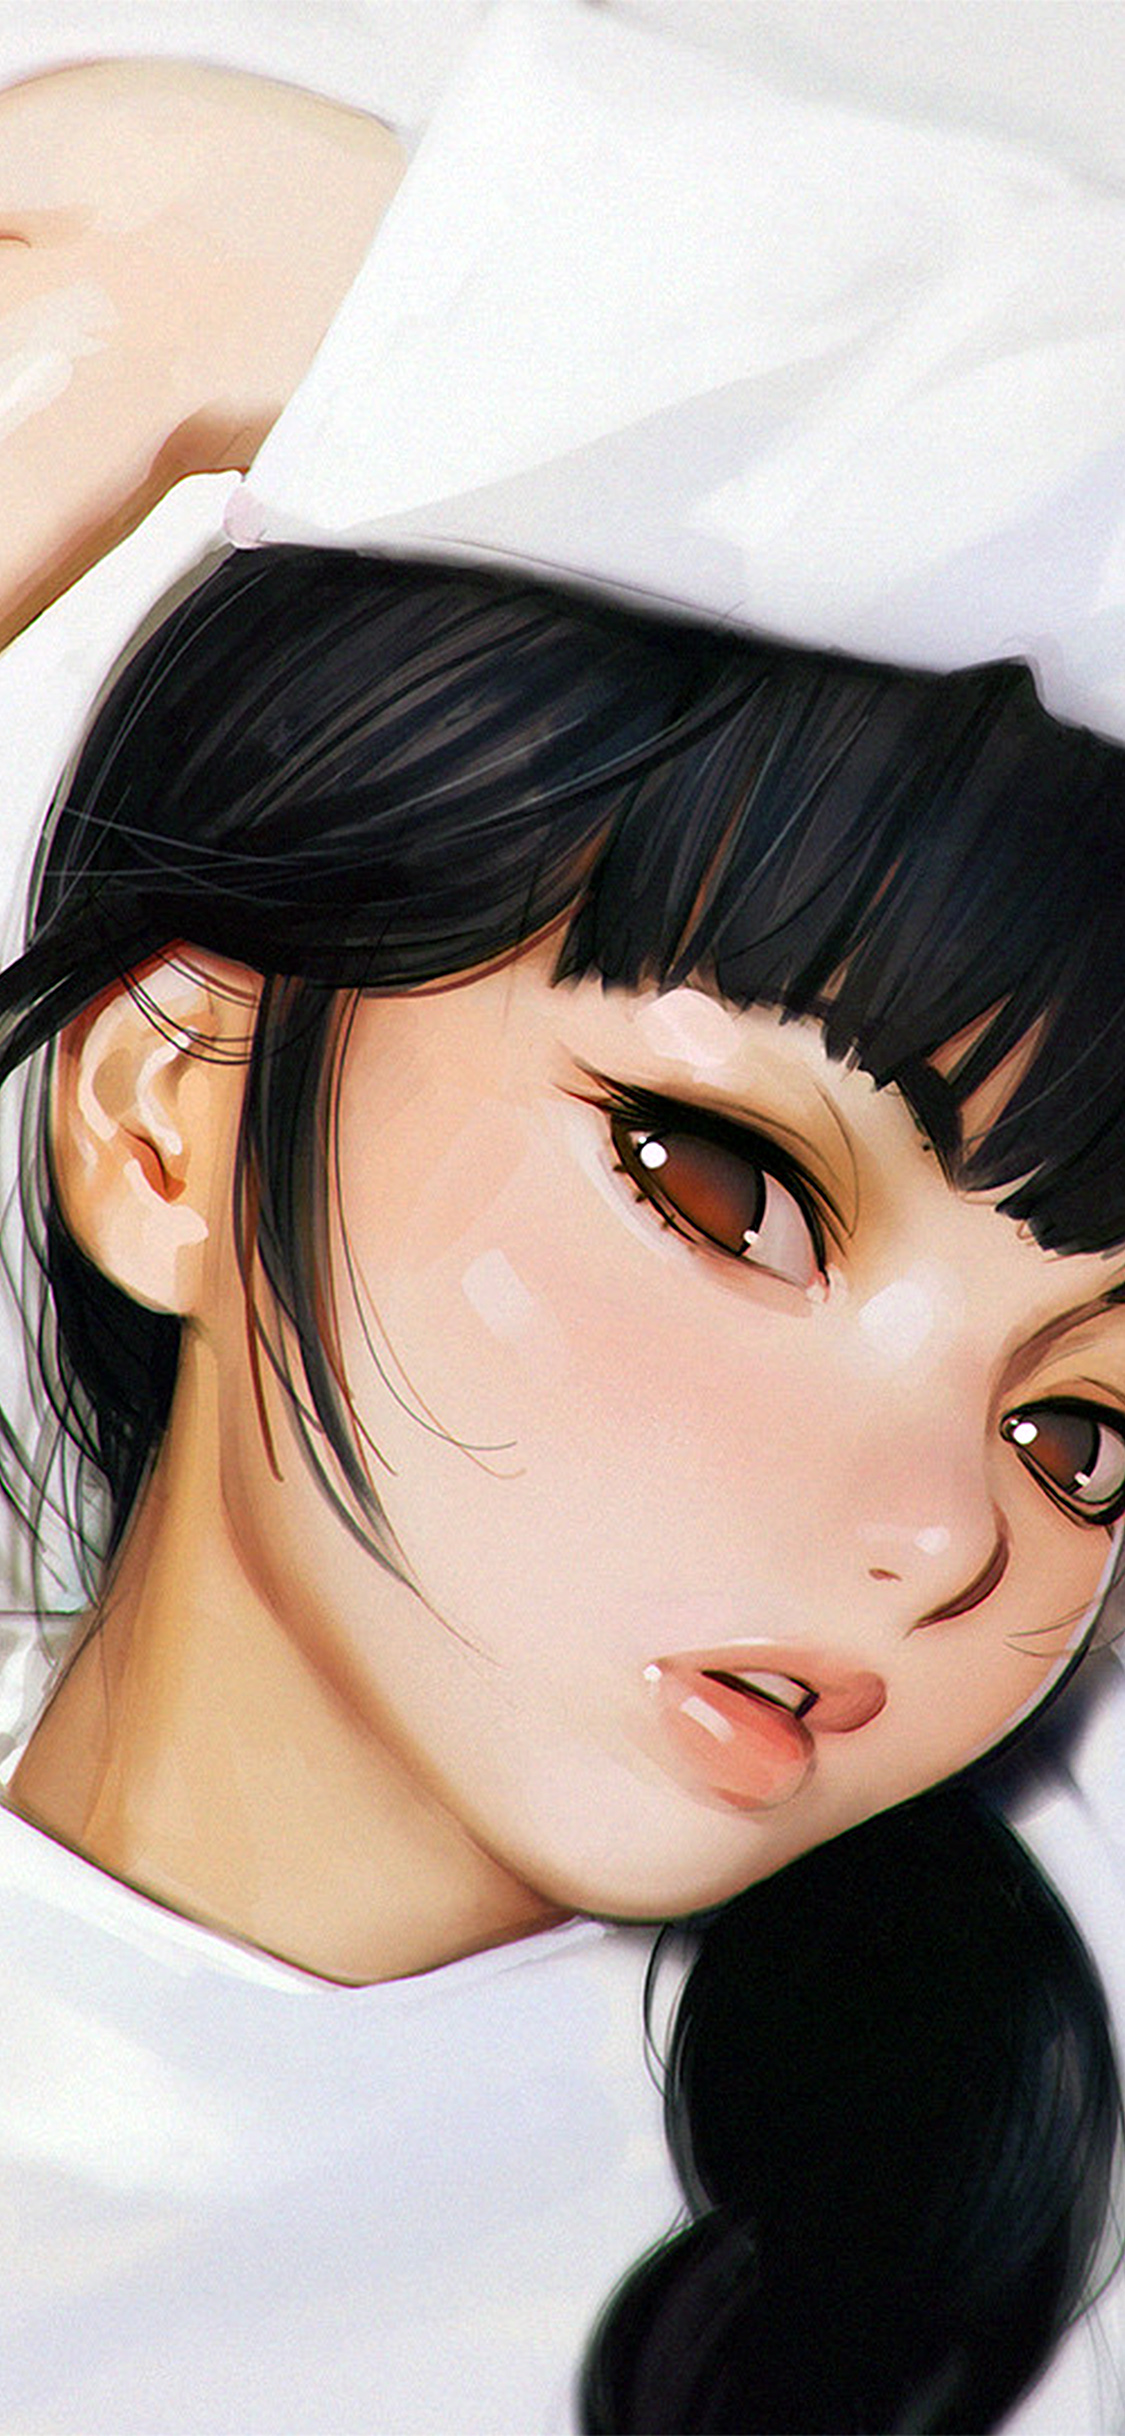 Papers Co Iphone Wallpaper Aw25 Ilya Kuvshinov Anime Girl Shy